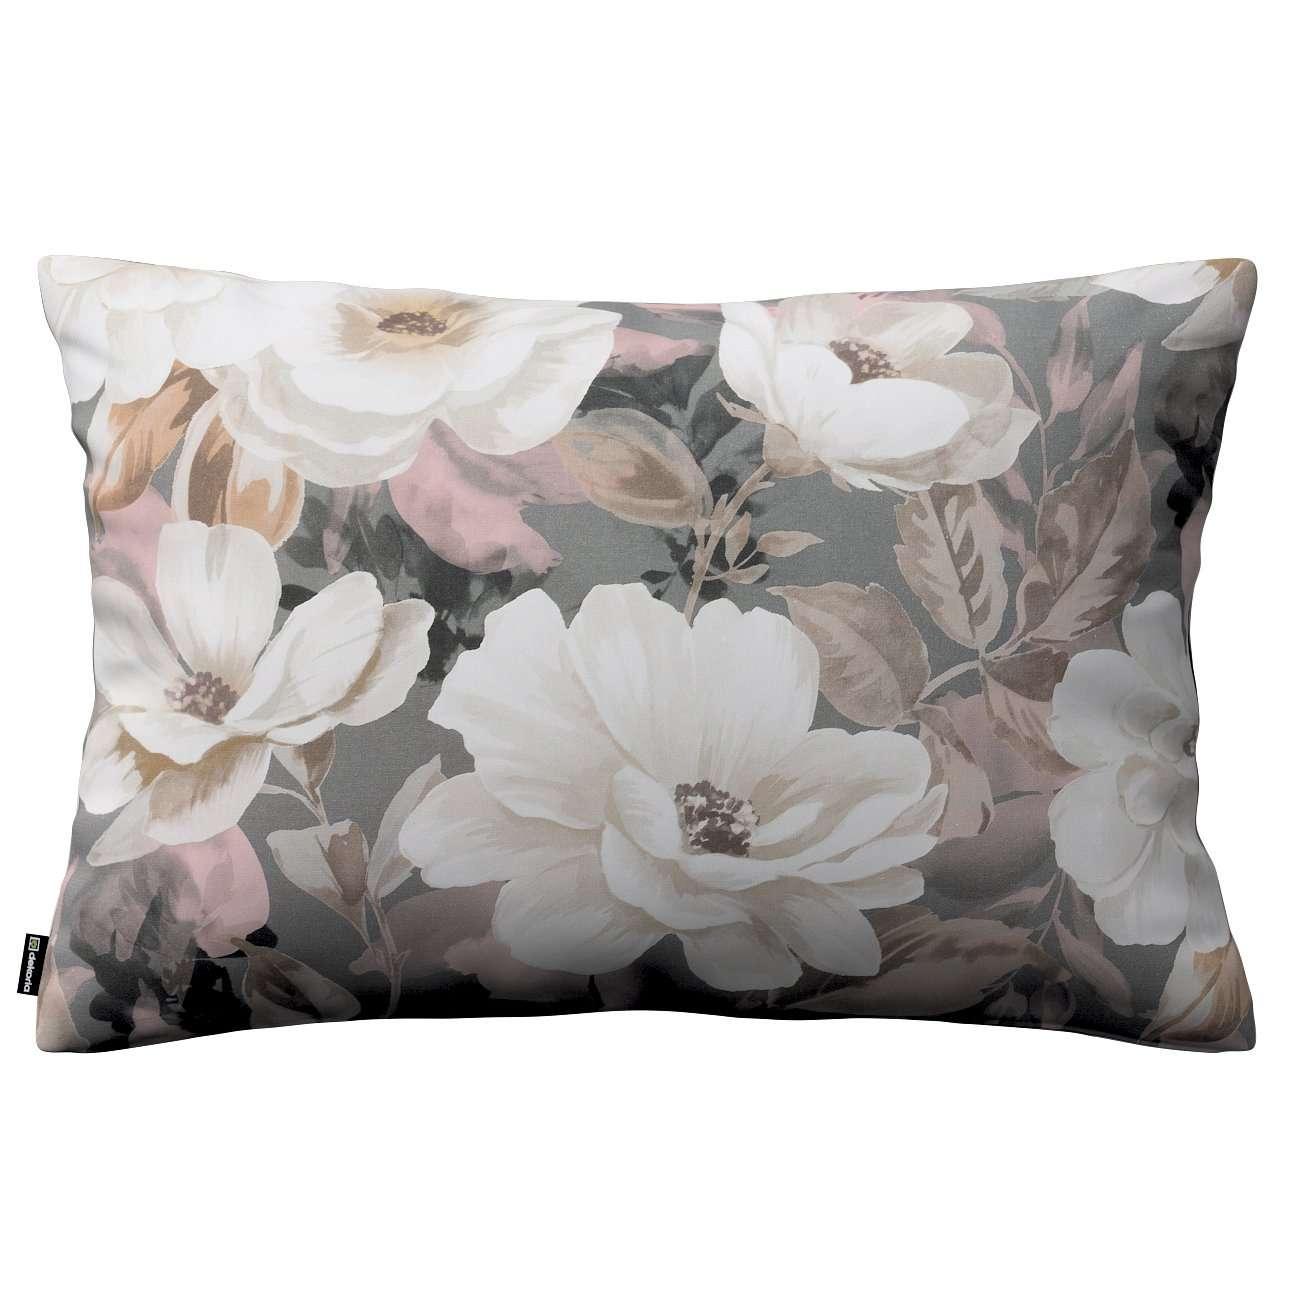 Kissenhülle Kinga 60x40cm, grau-rosa, 60 × 40 cm, Gardenia